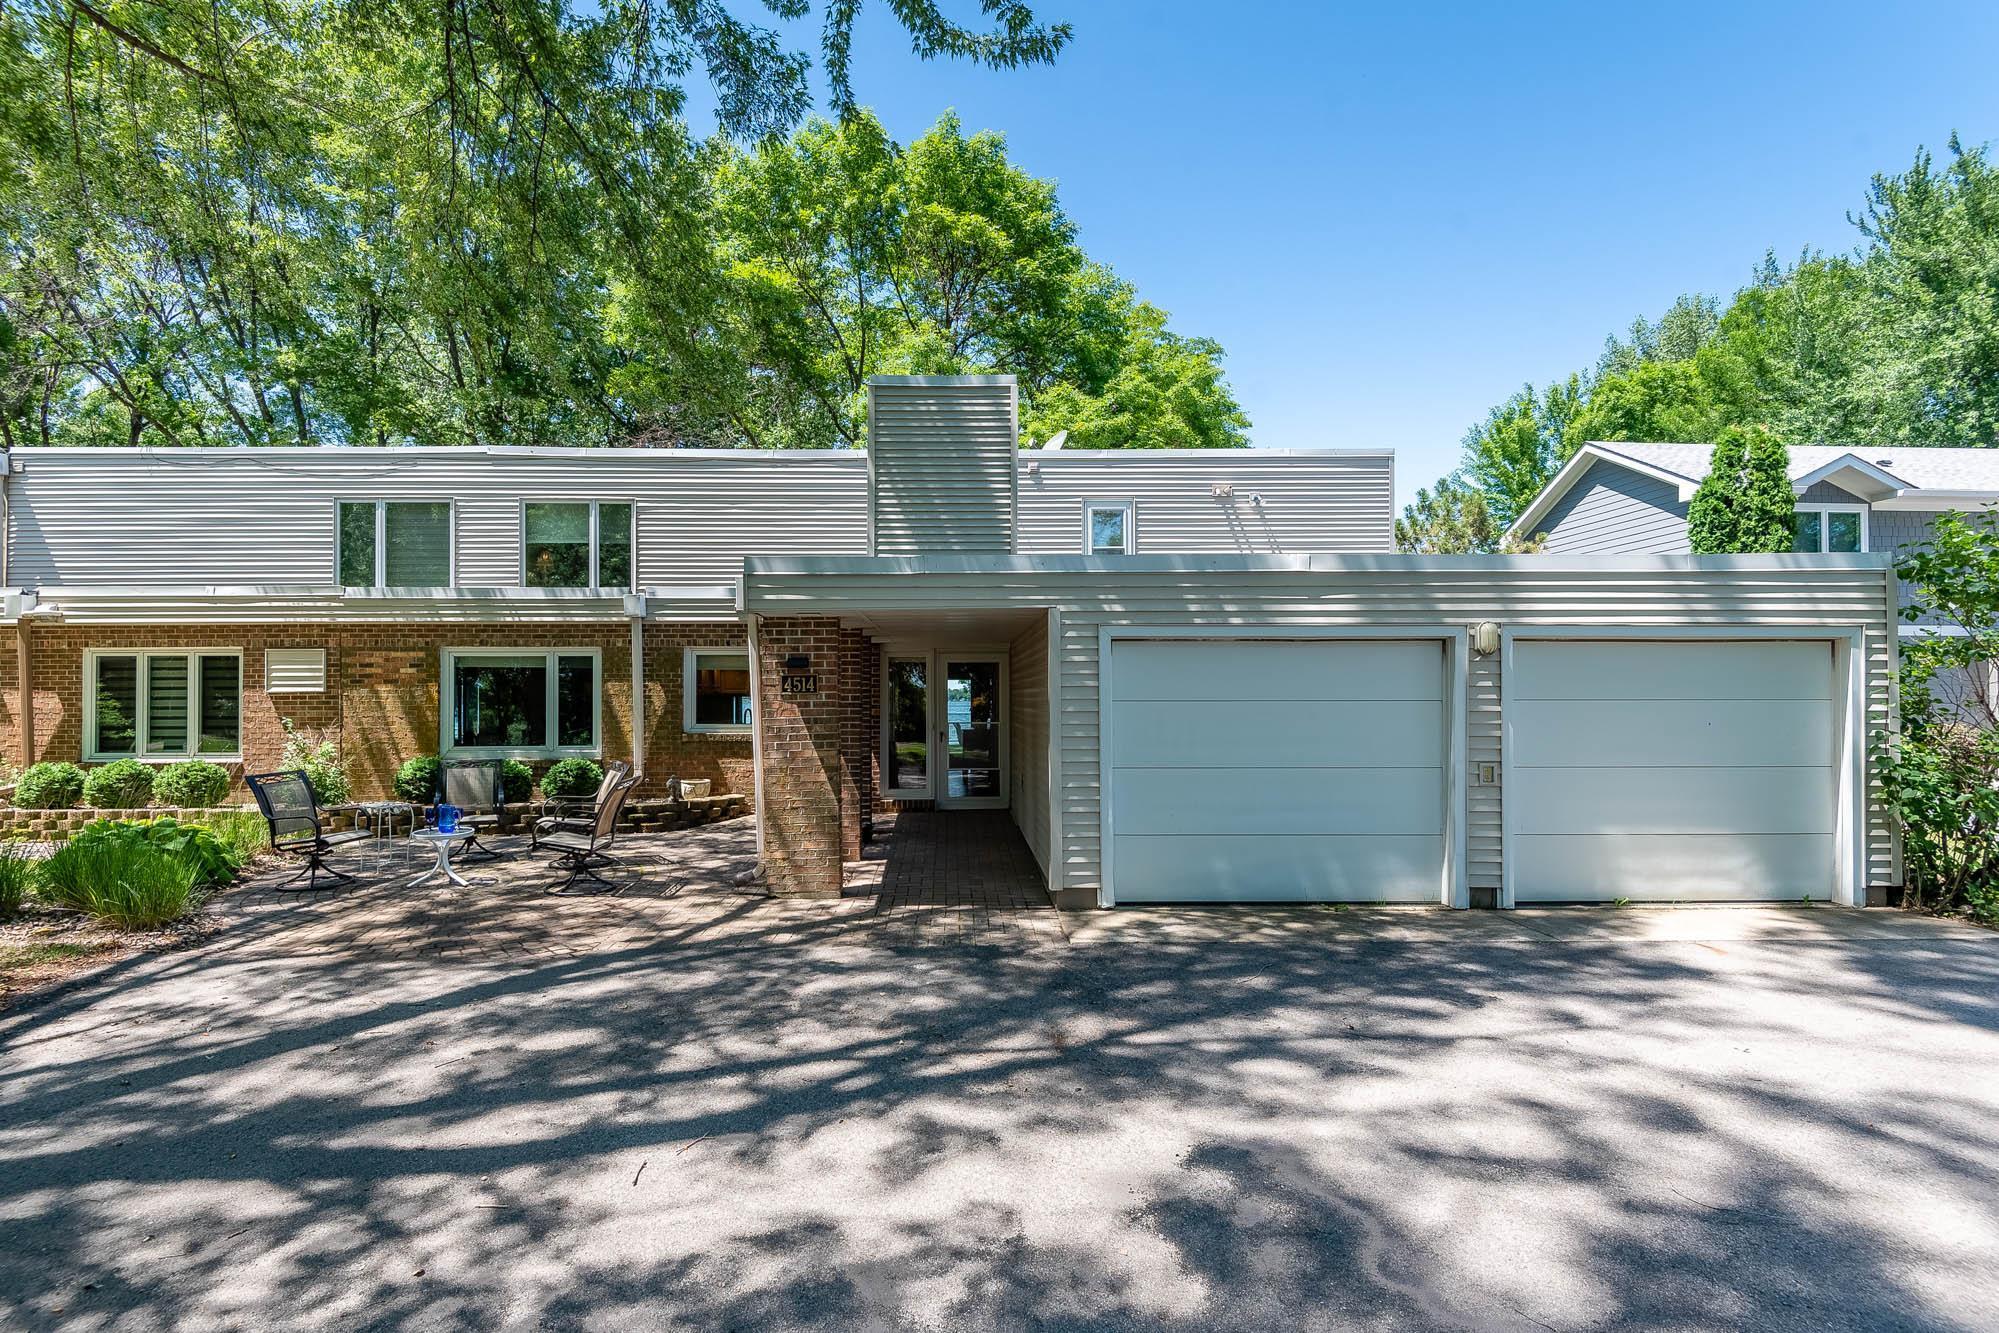 4514 Washington Blvd Boulevard Property Photo - Washington Twp, MN real estate listing